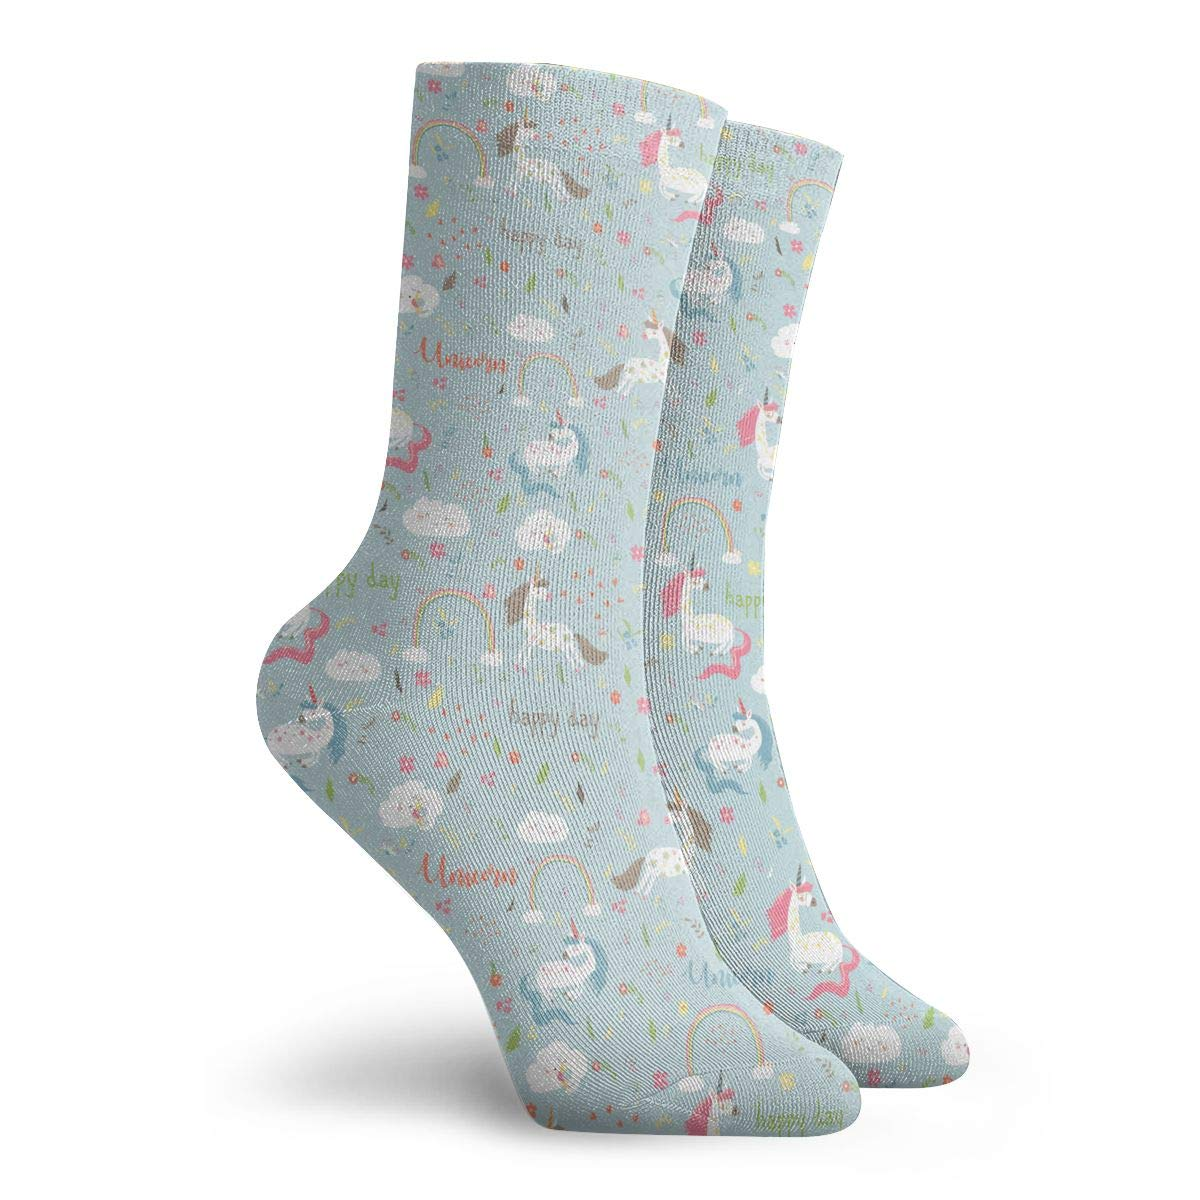 Unisex Rainbow And Unicorn Athletic Quarter Ankle Print Breathable Hiking Running Socks